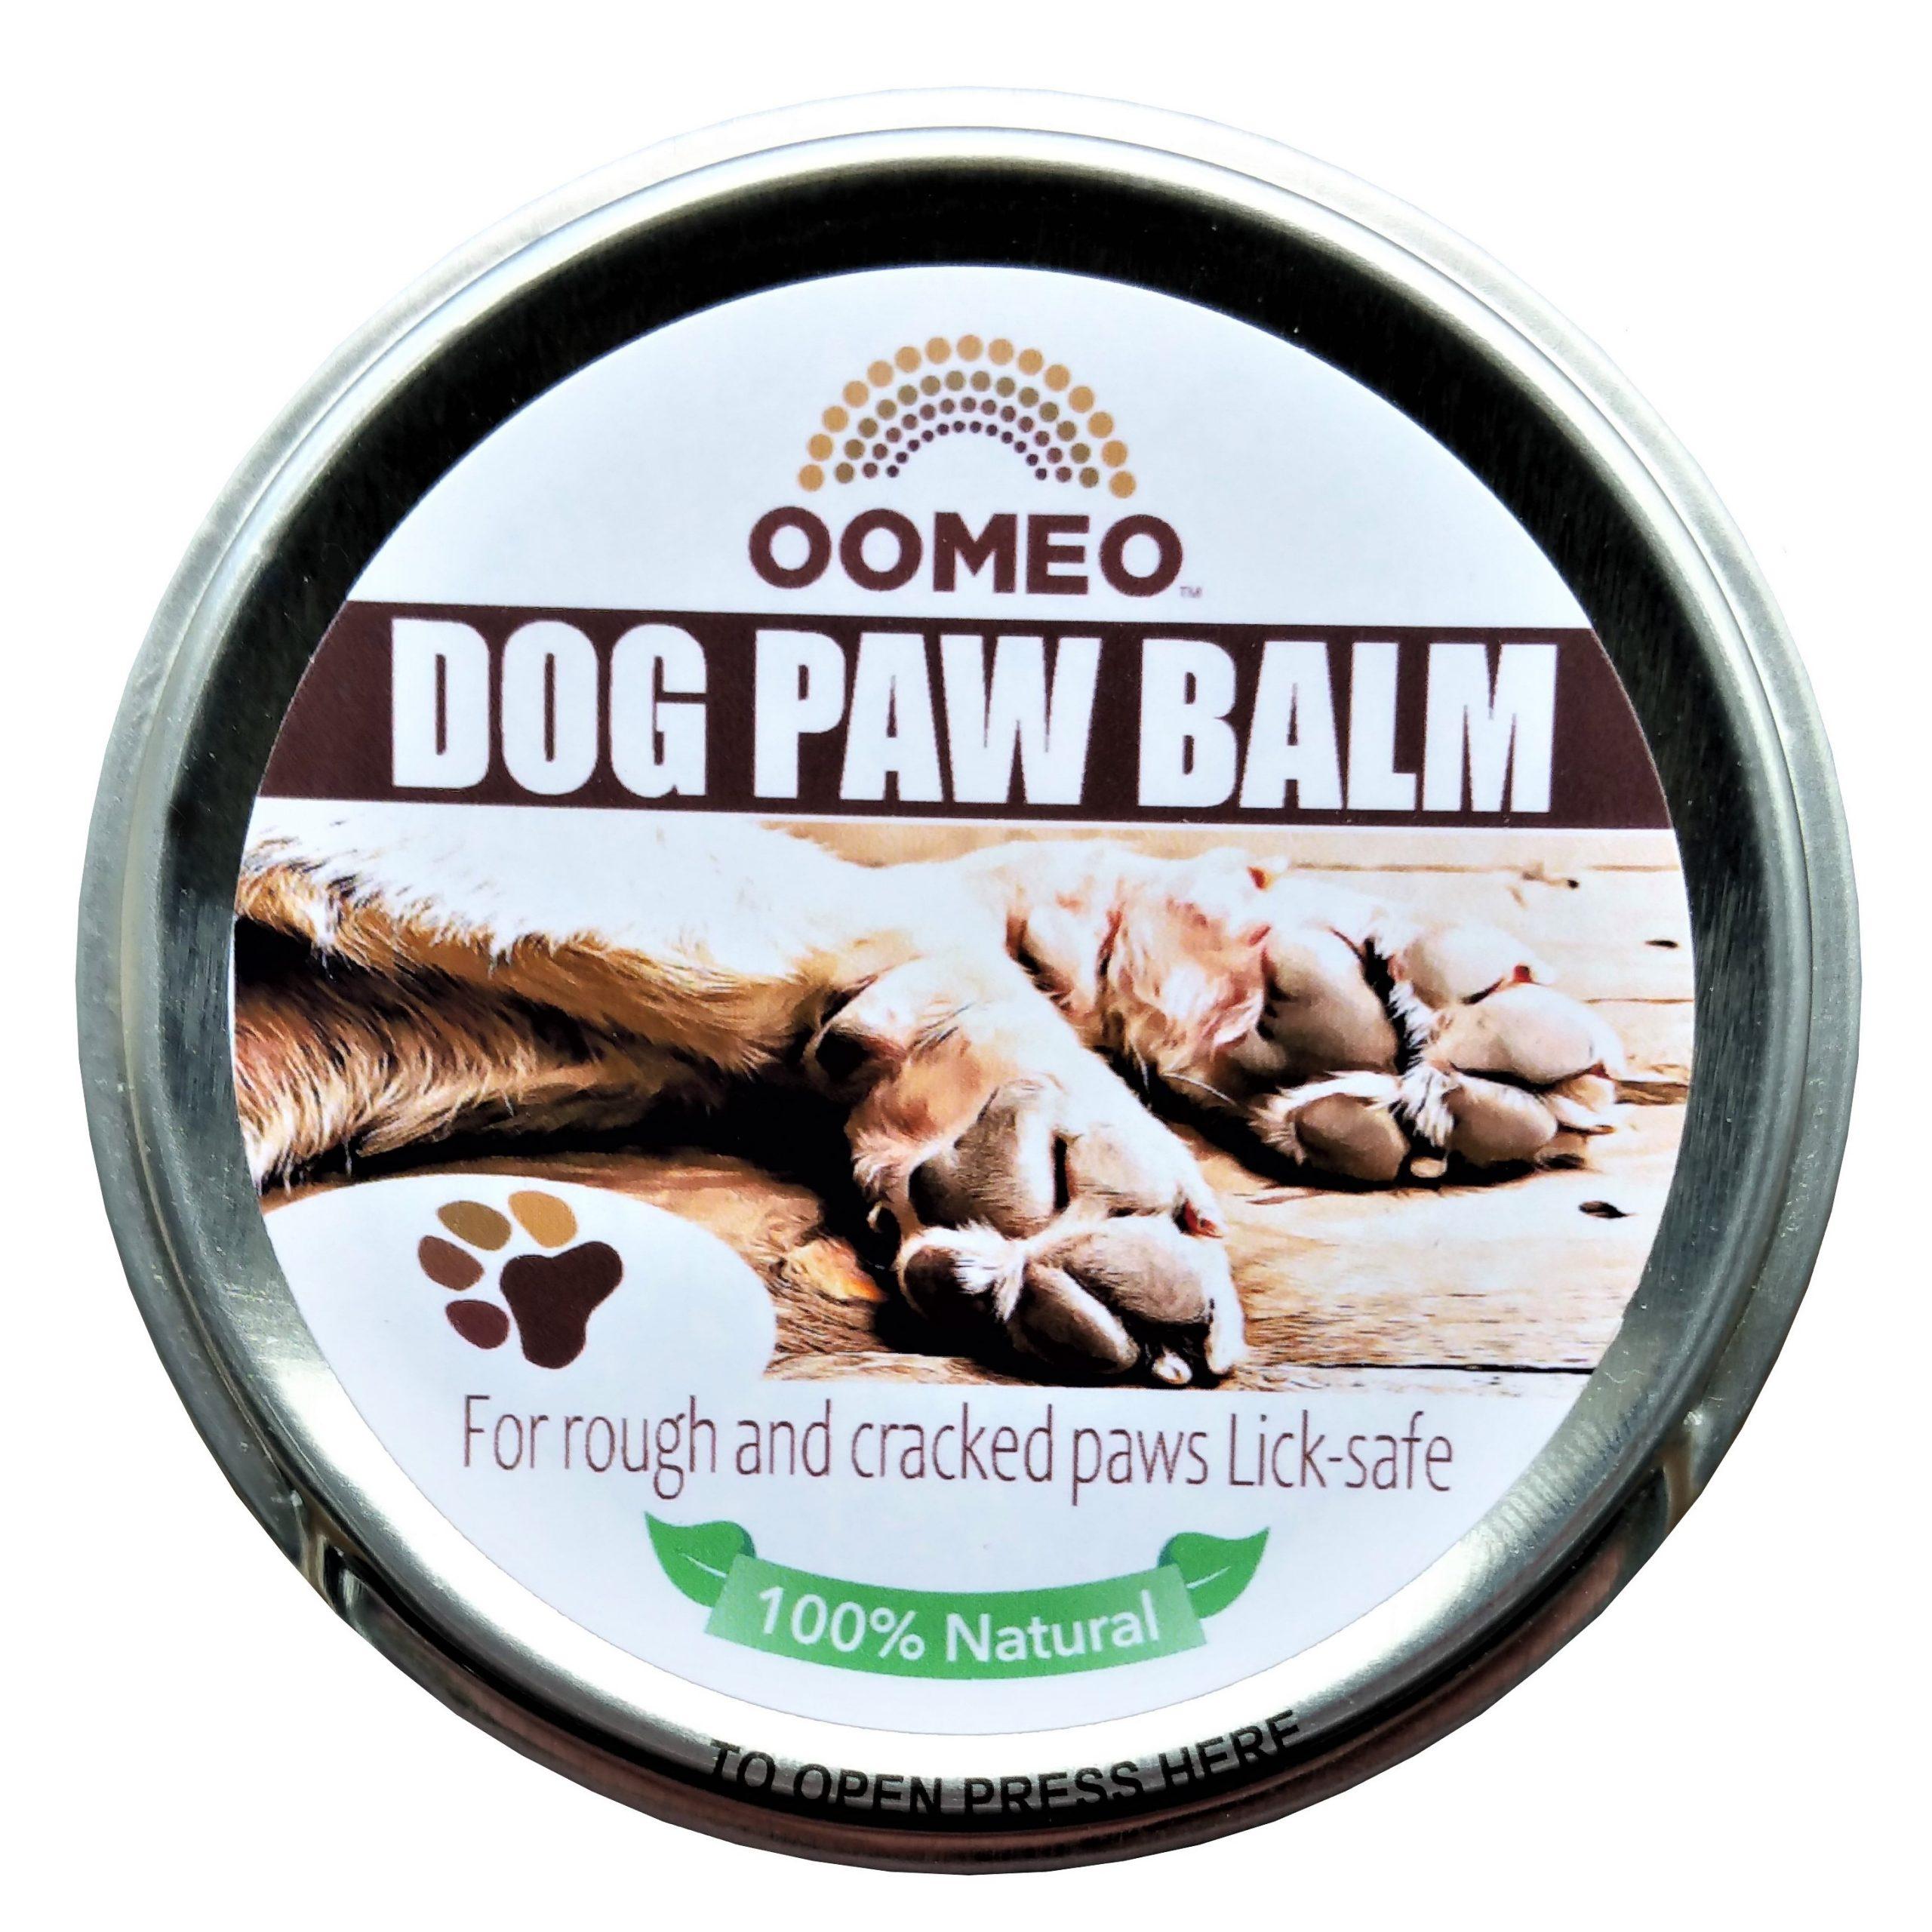 Wholesale dog paw balm (50ml)